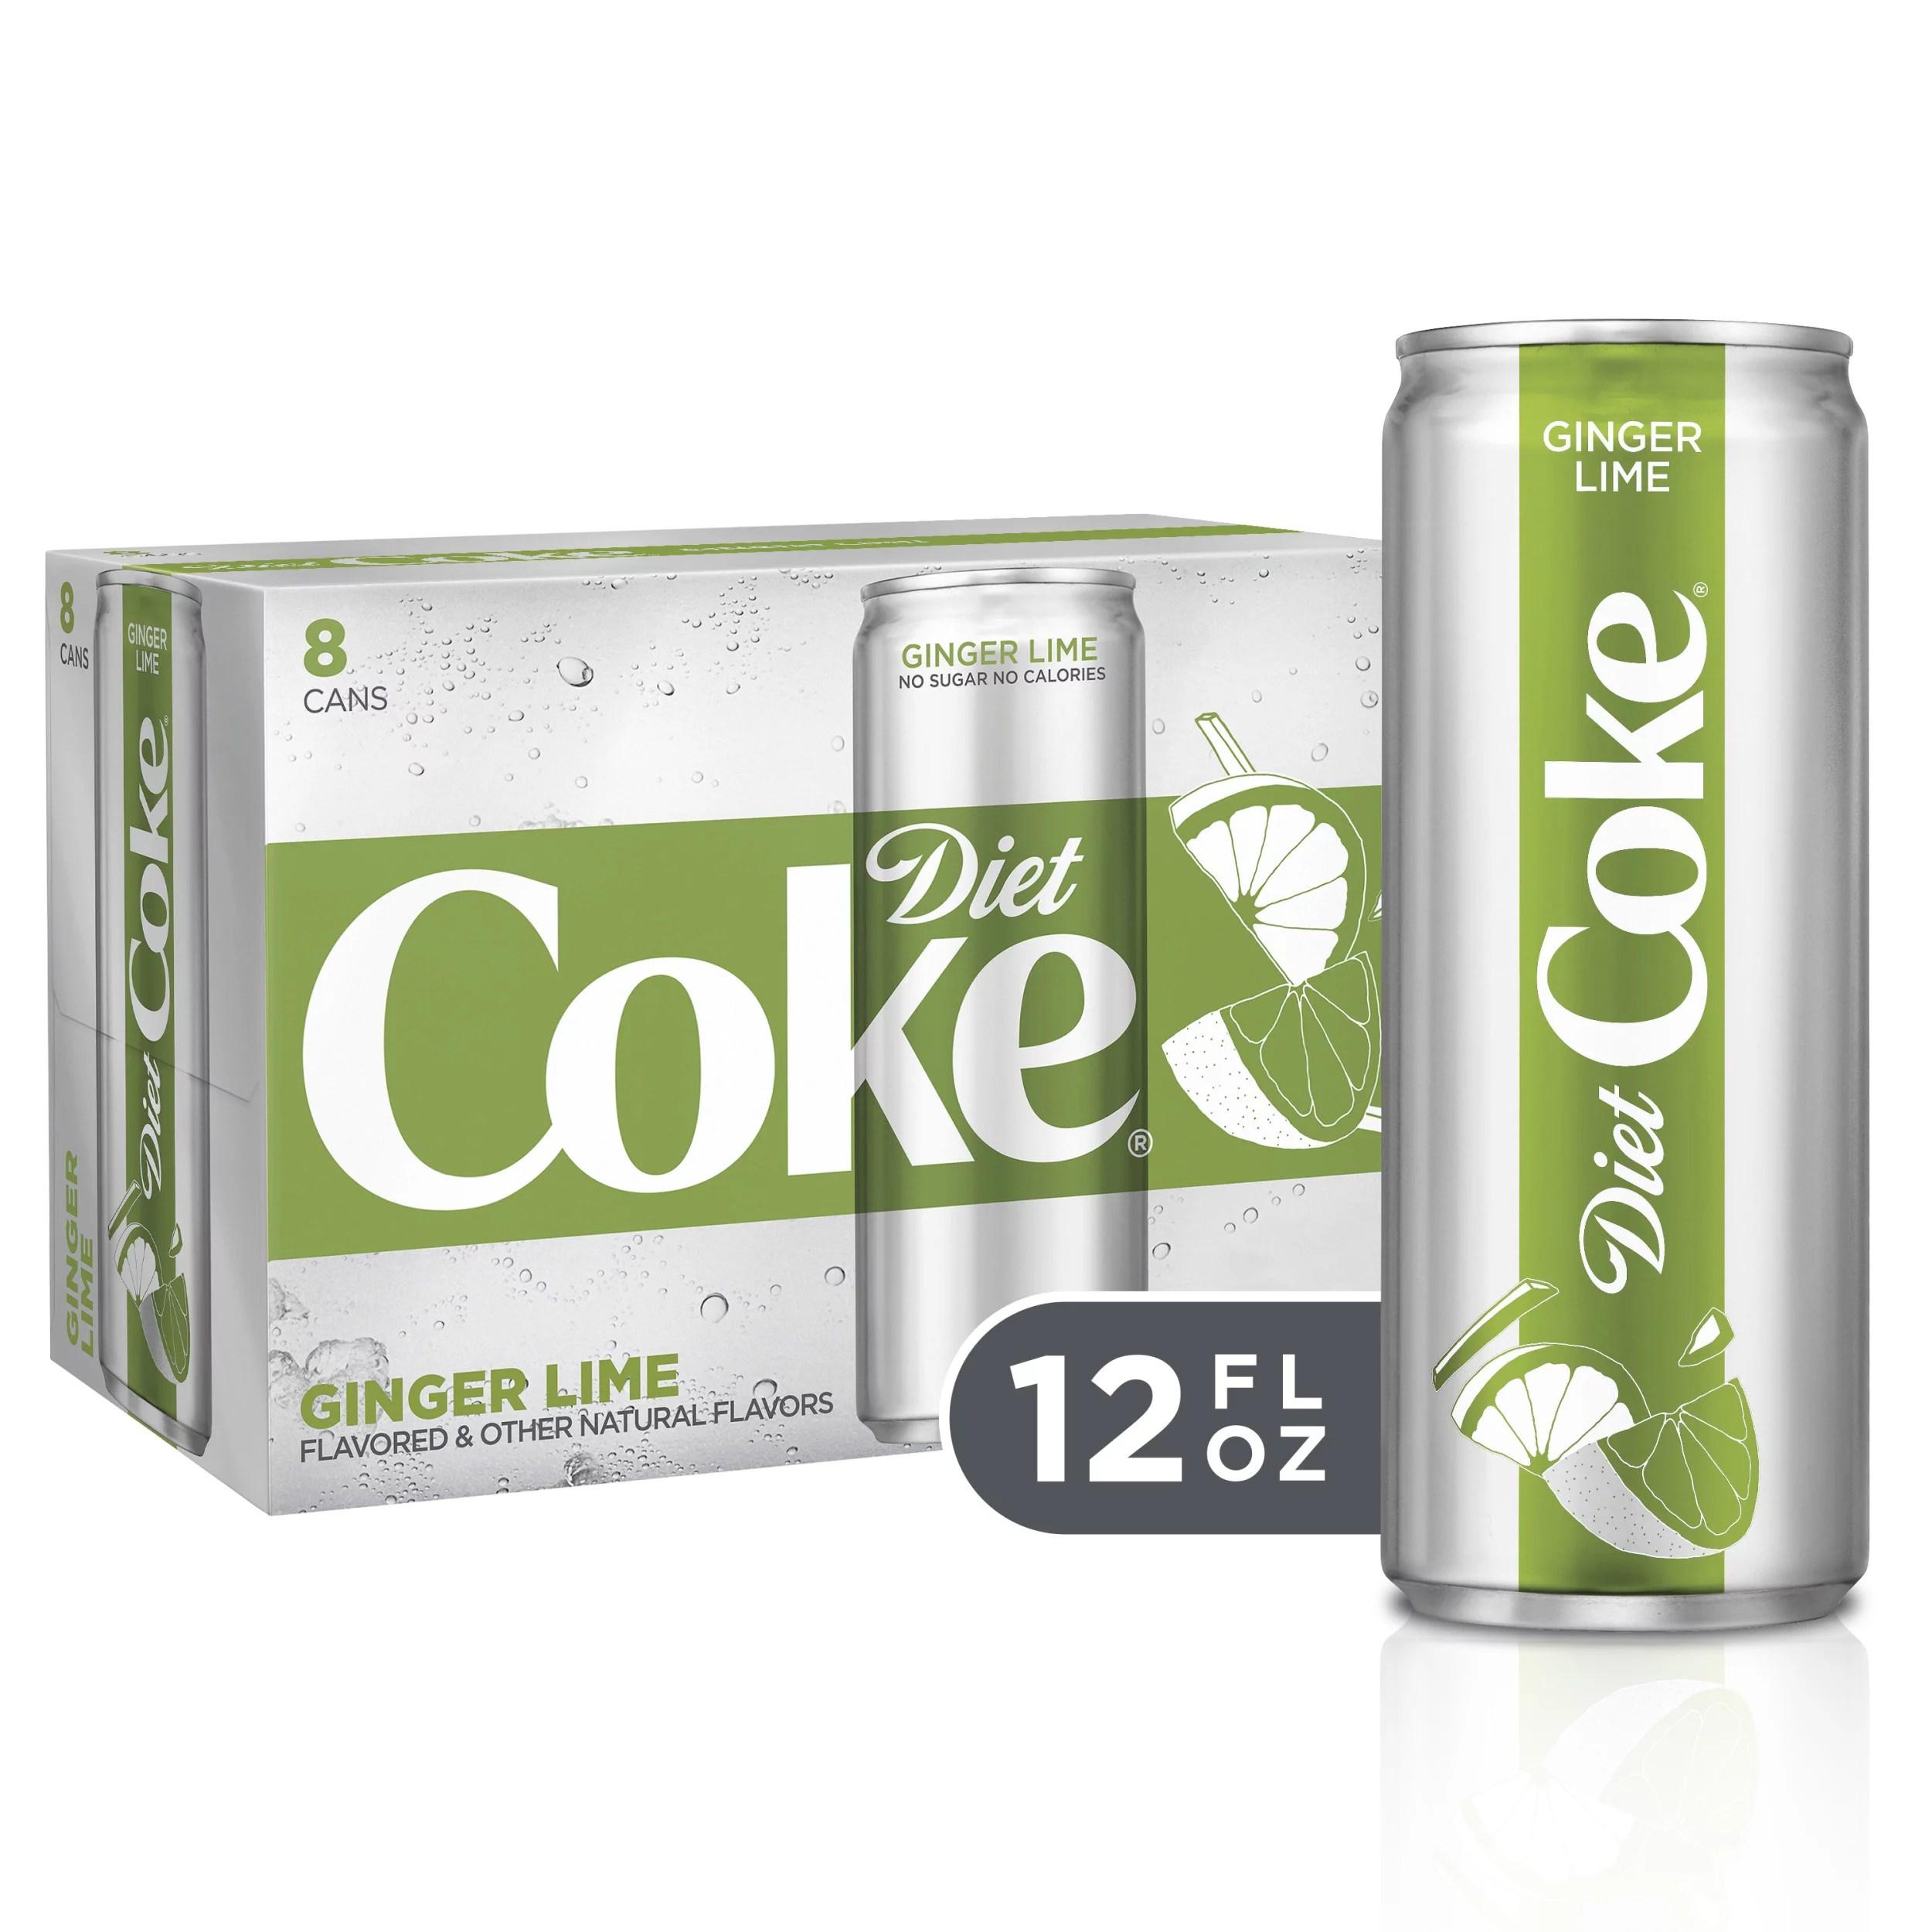 Diet Coke Ginger Lime Soda Soft Drink 12 fl oz 8 Pack ...